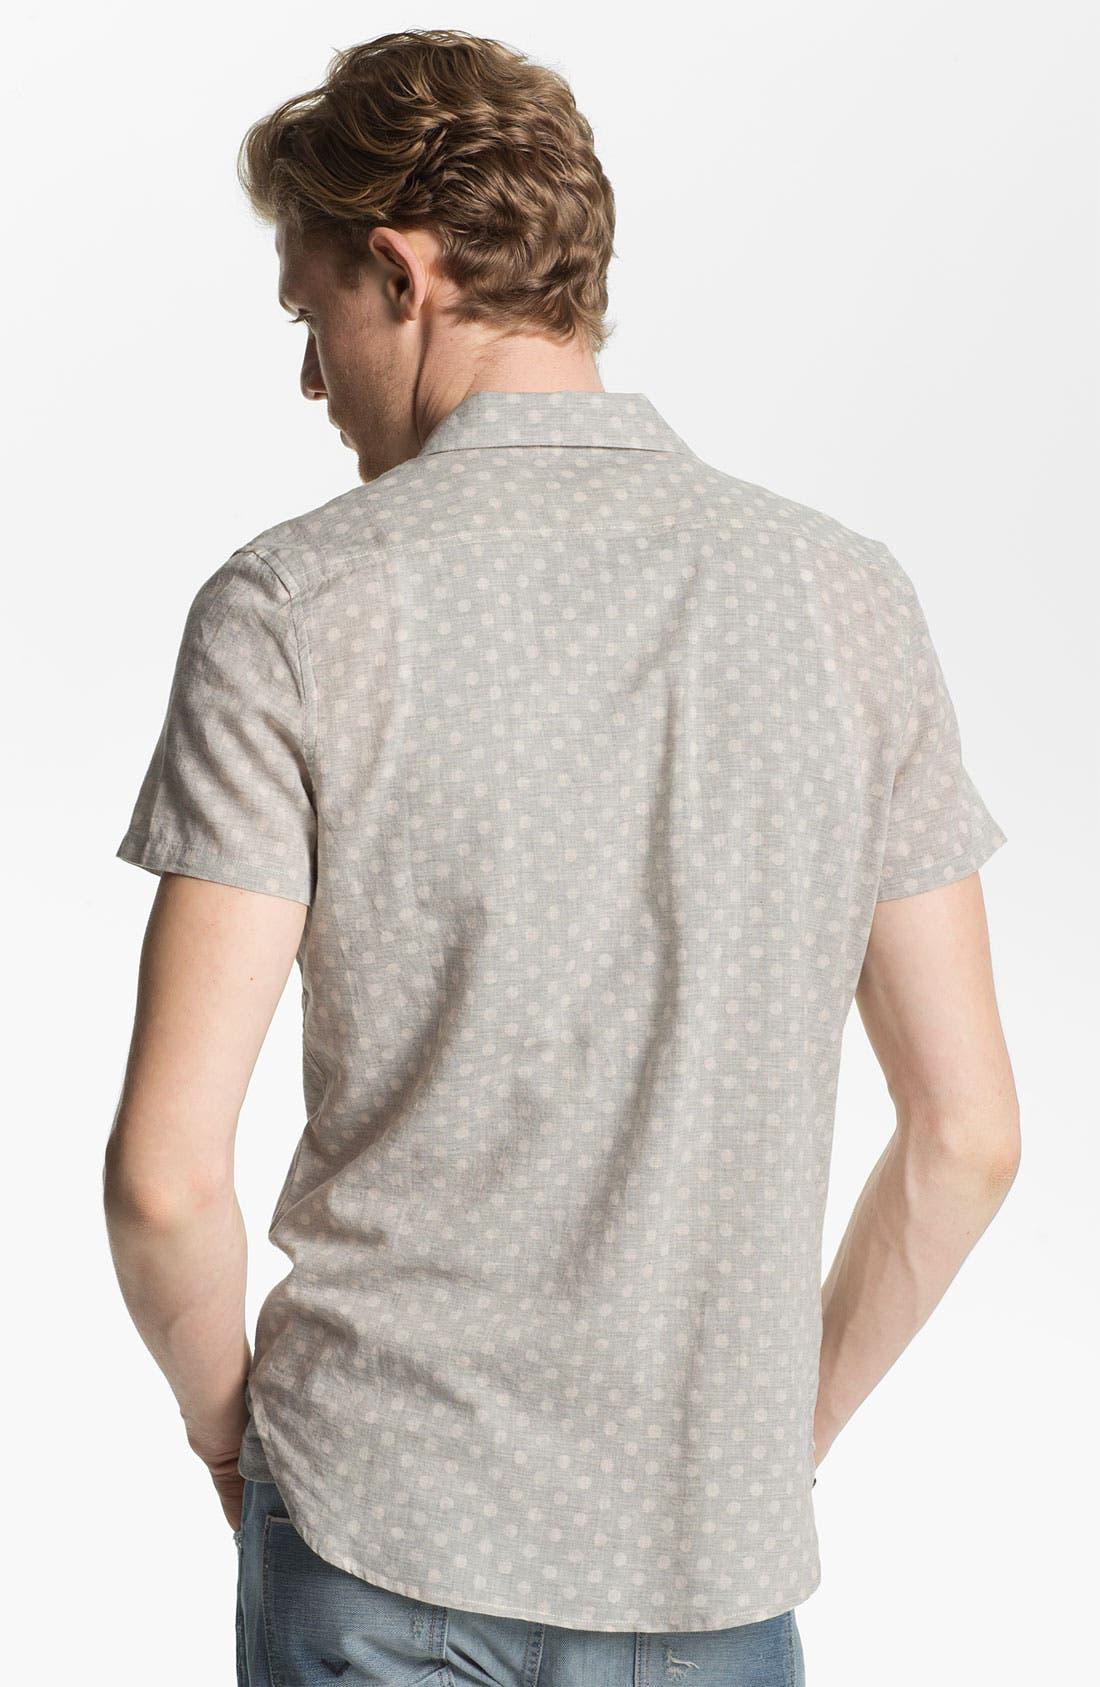 Alternate Image 2  - Deus Ex Machina 'Billy' Dot Patterned Woven Shirt